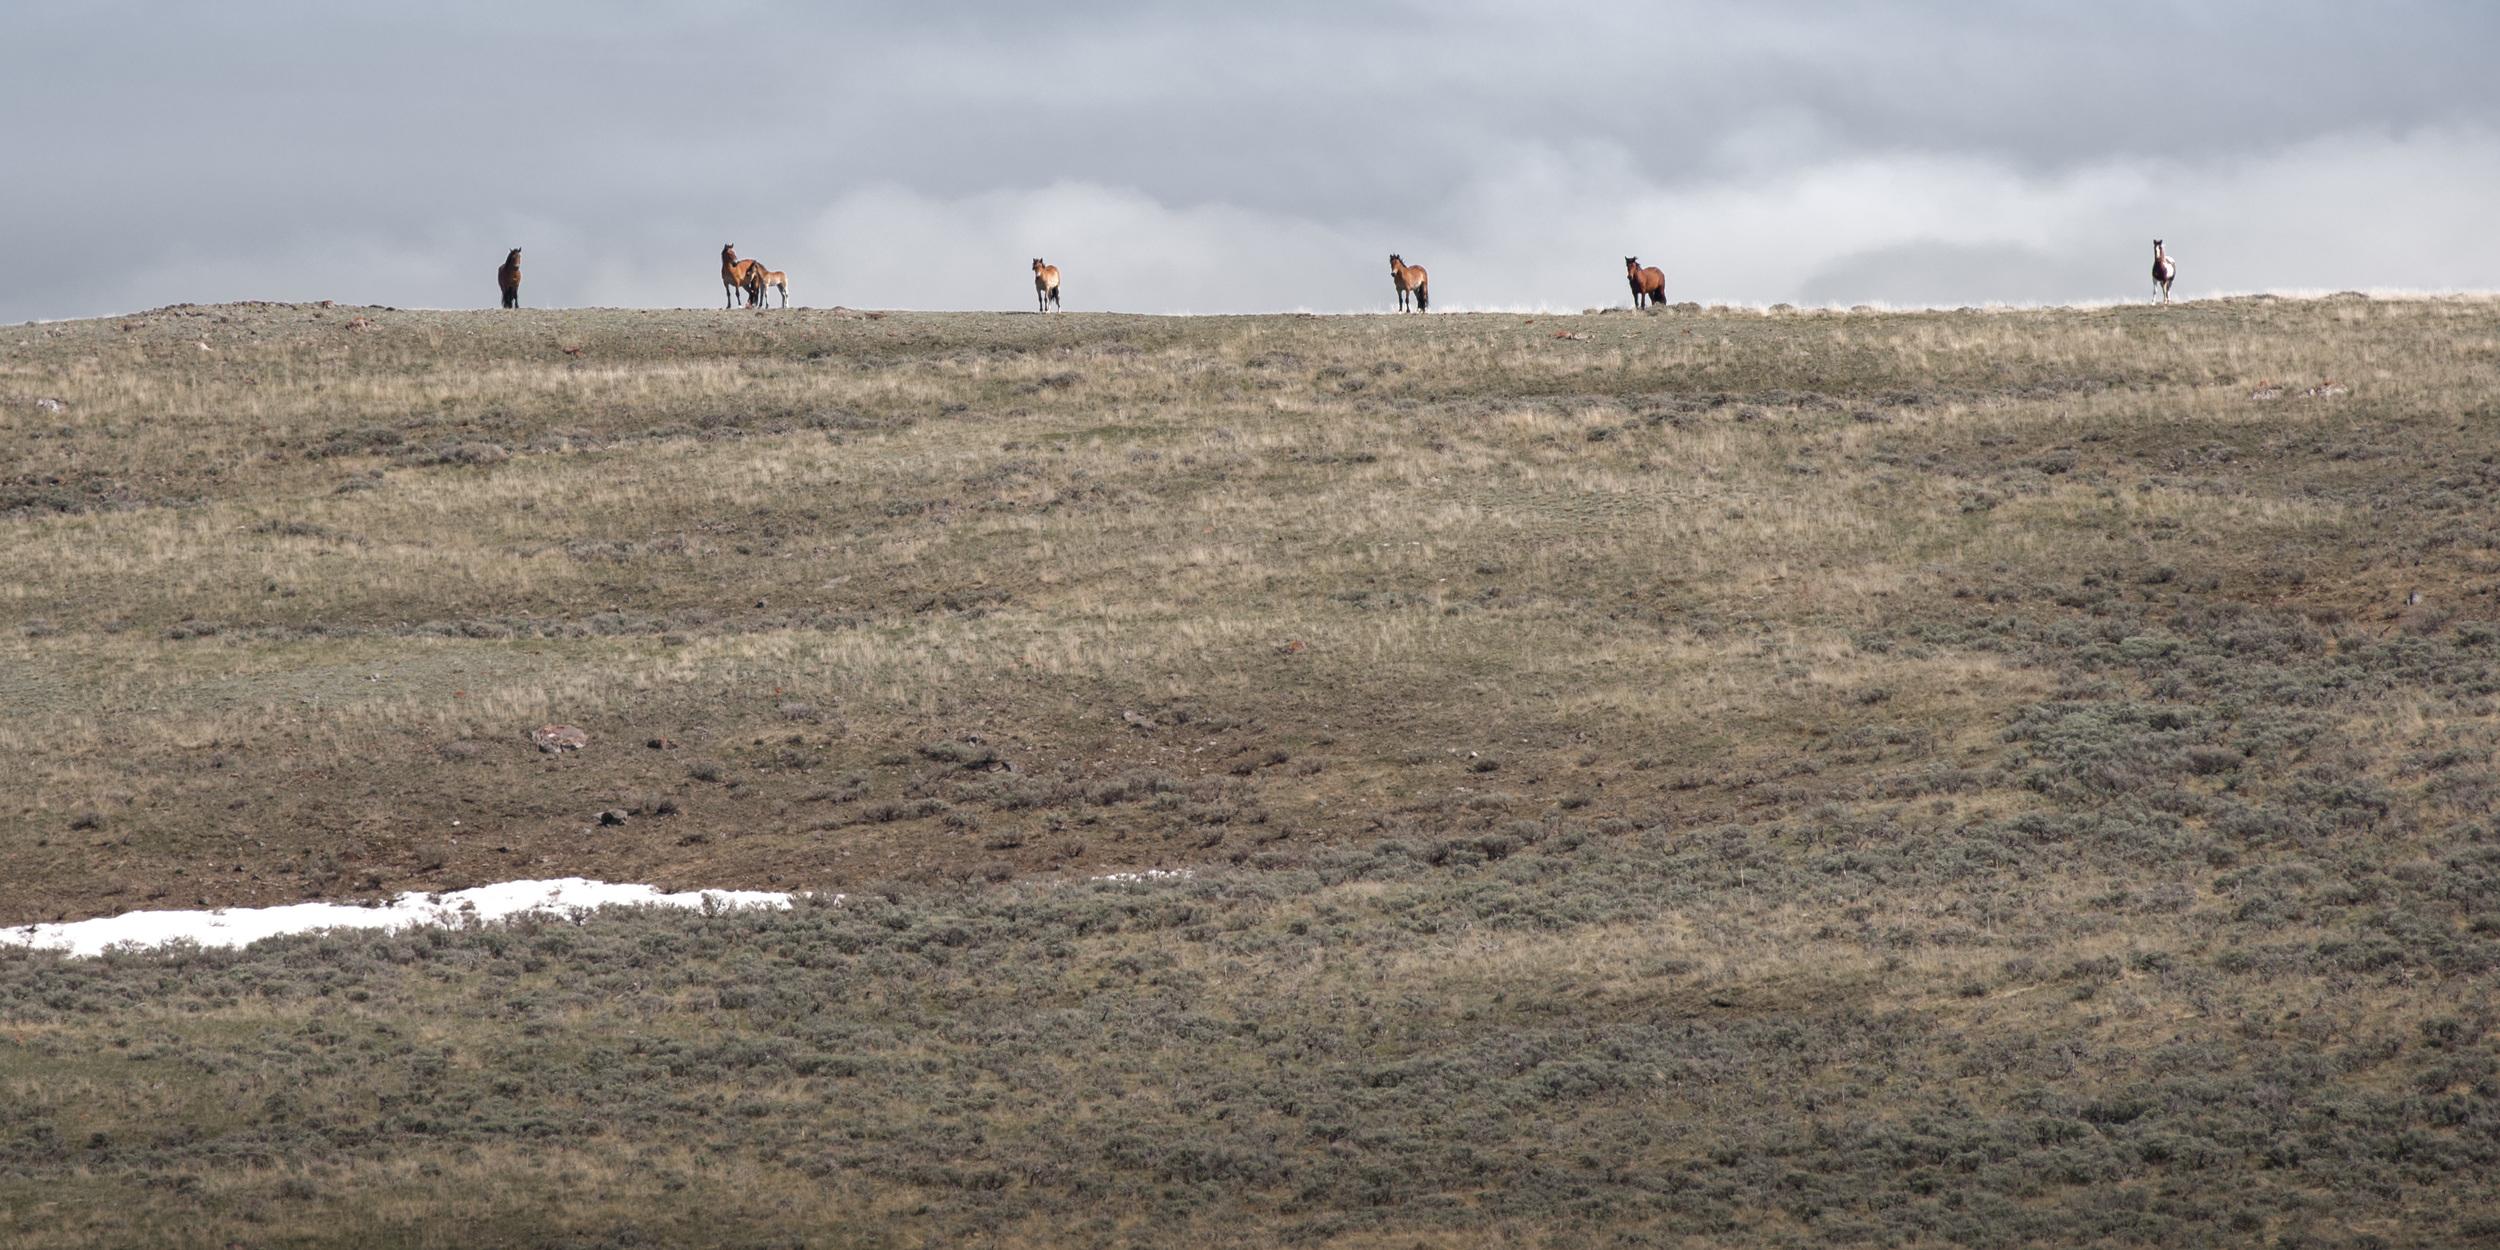 Ridgeline Mustangs